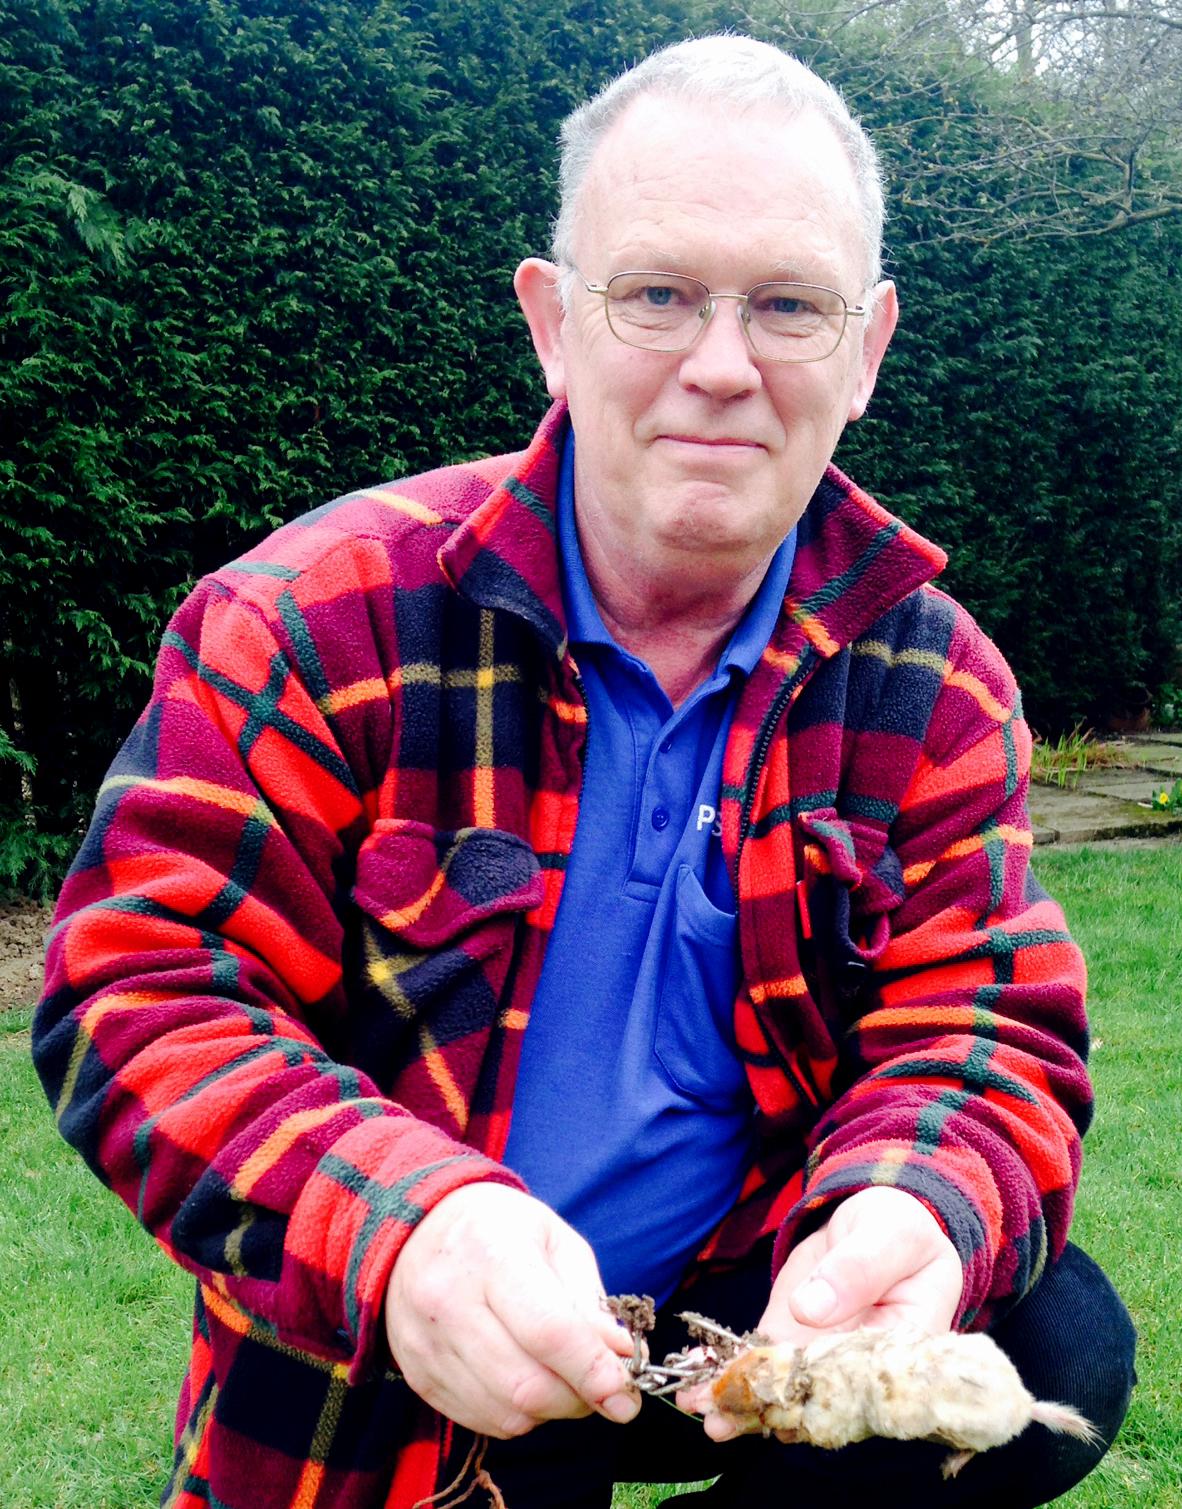 Rare Albino Mole Caught at Woodham